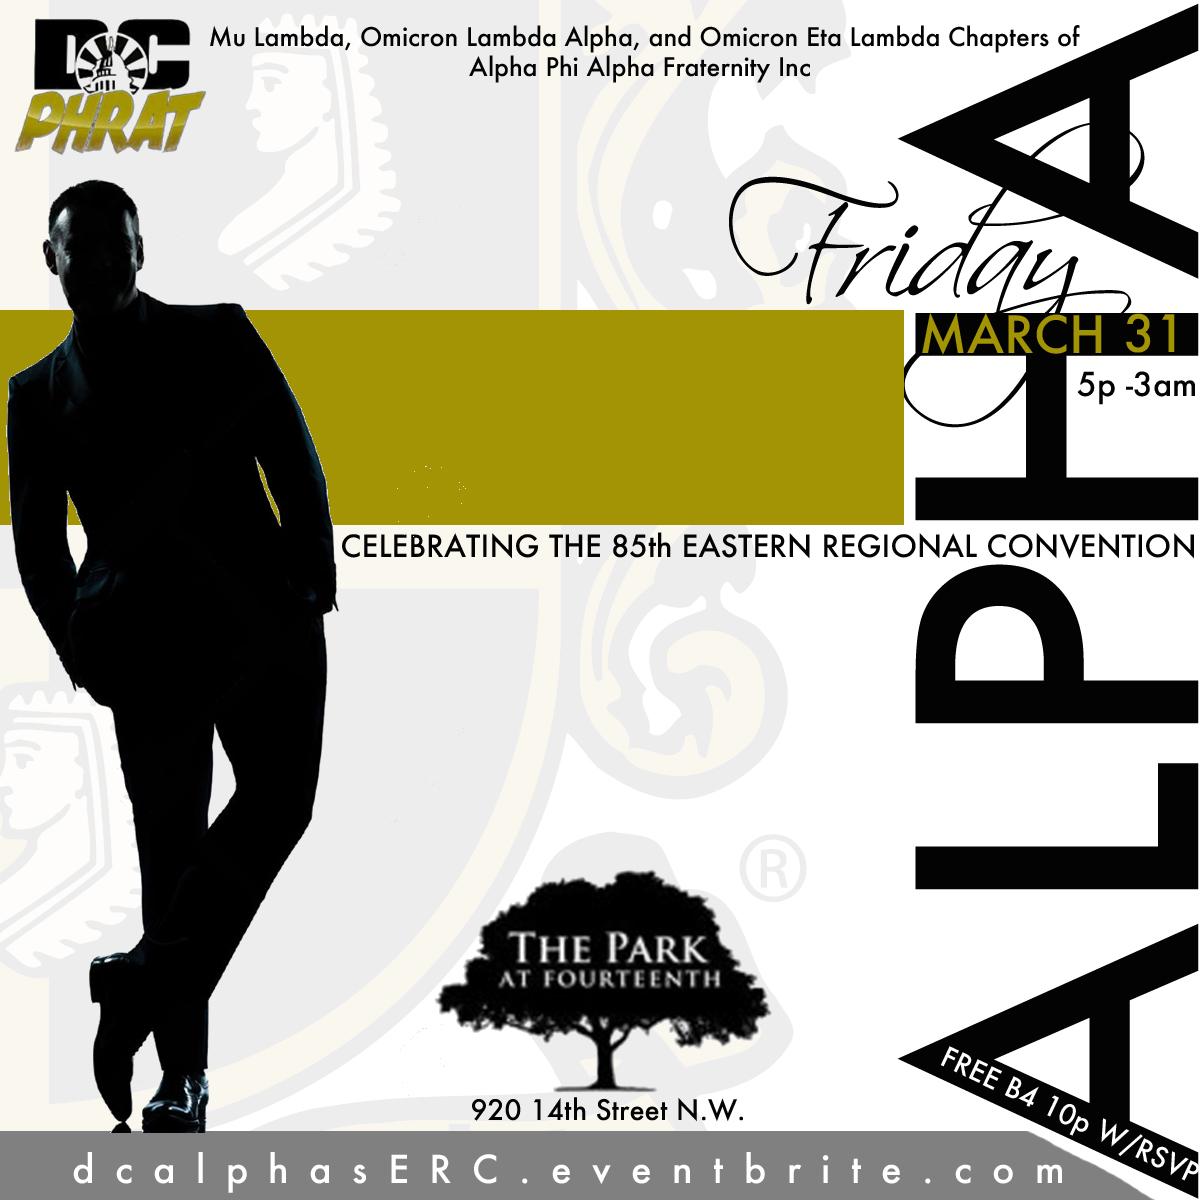 Park 14th Friday